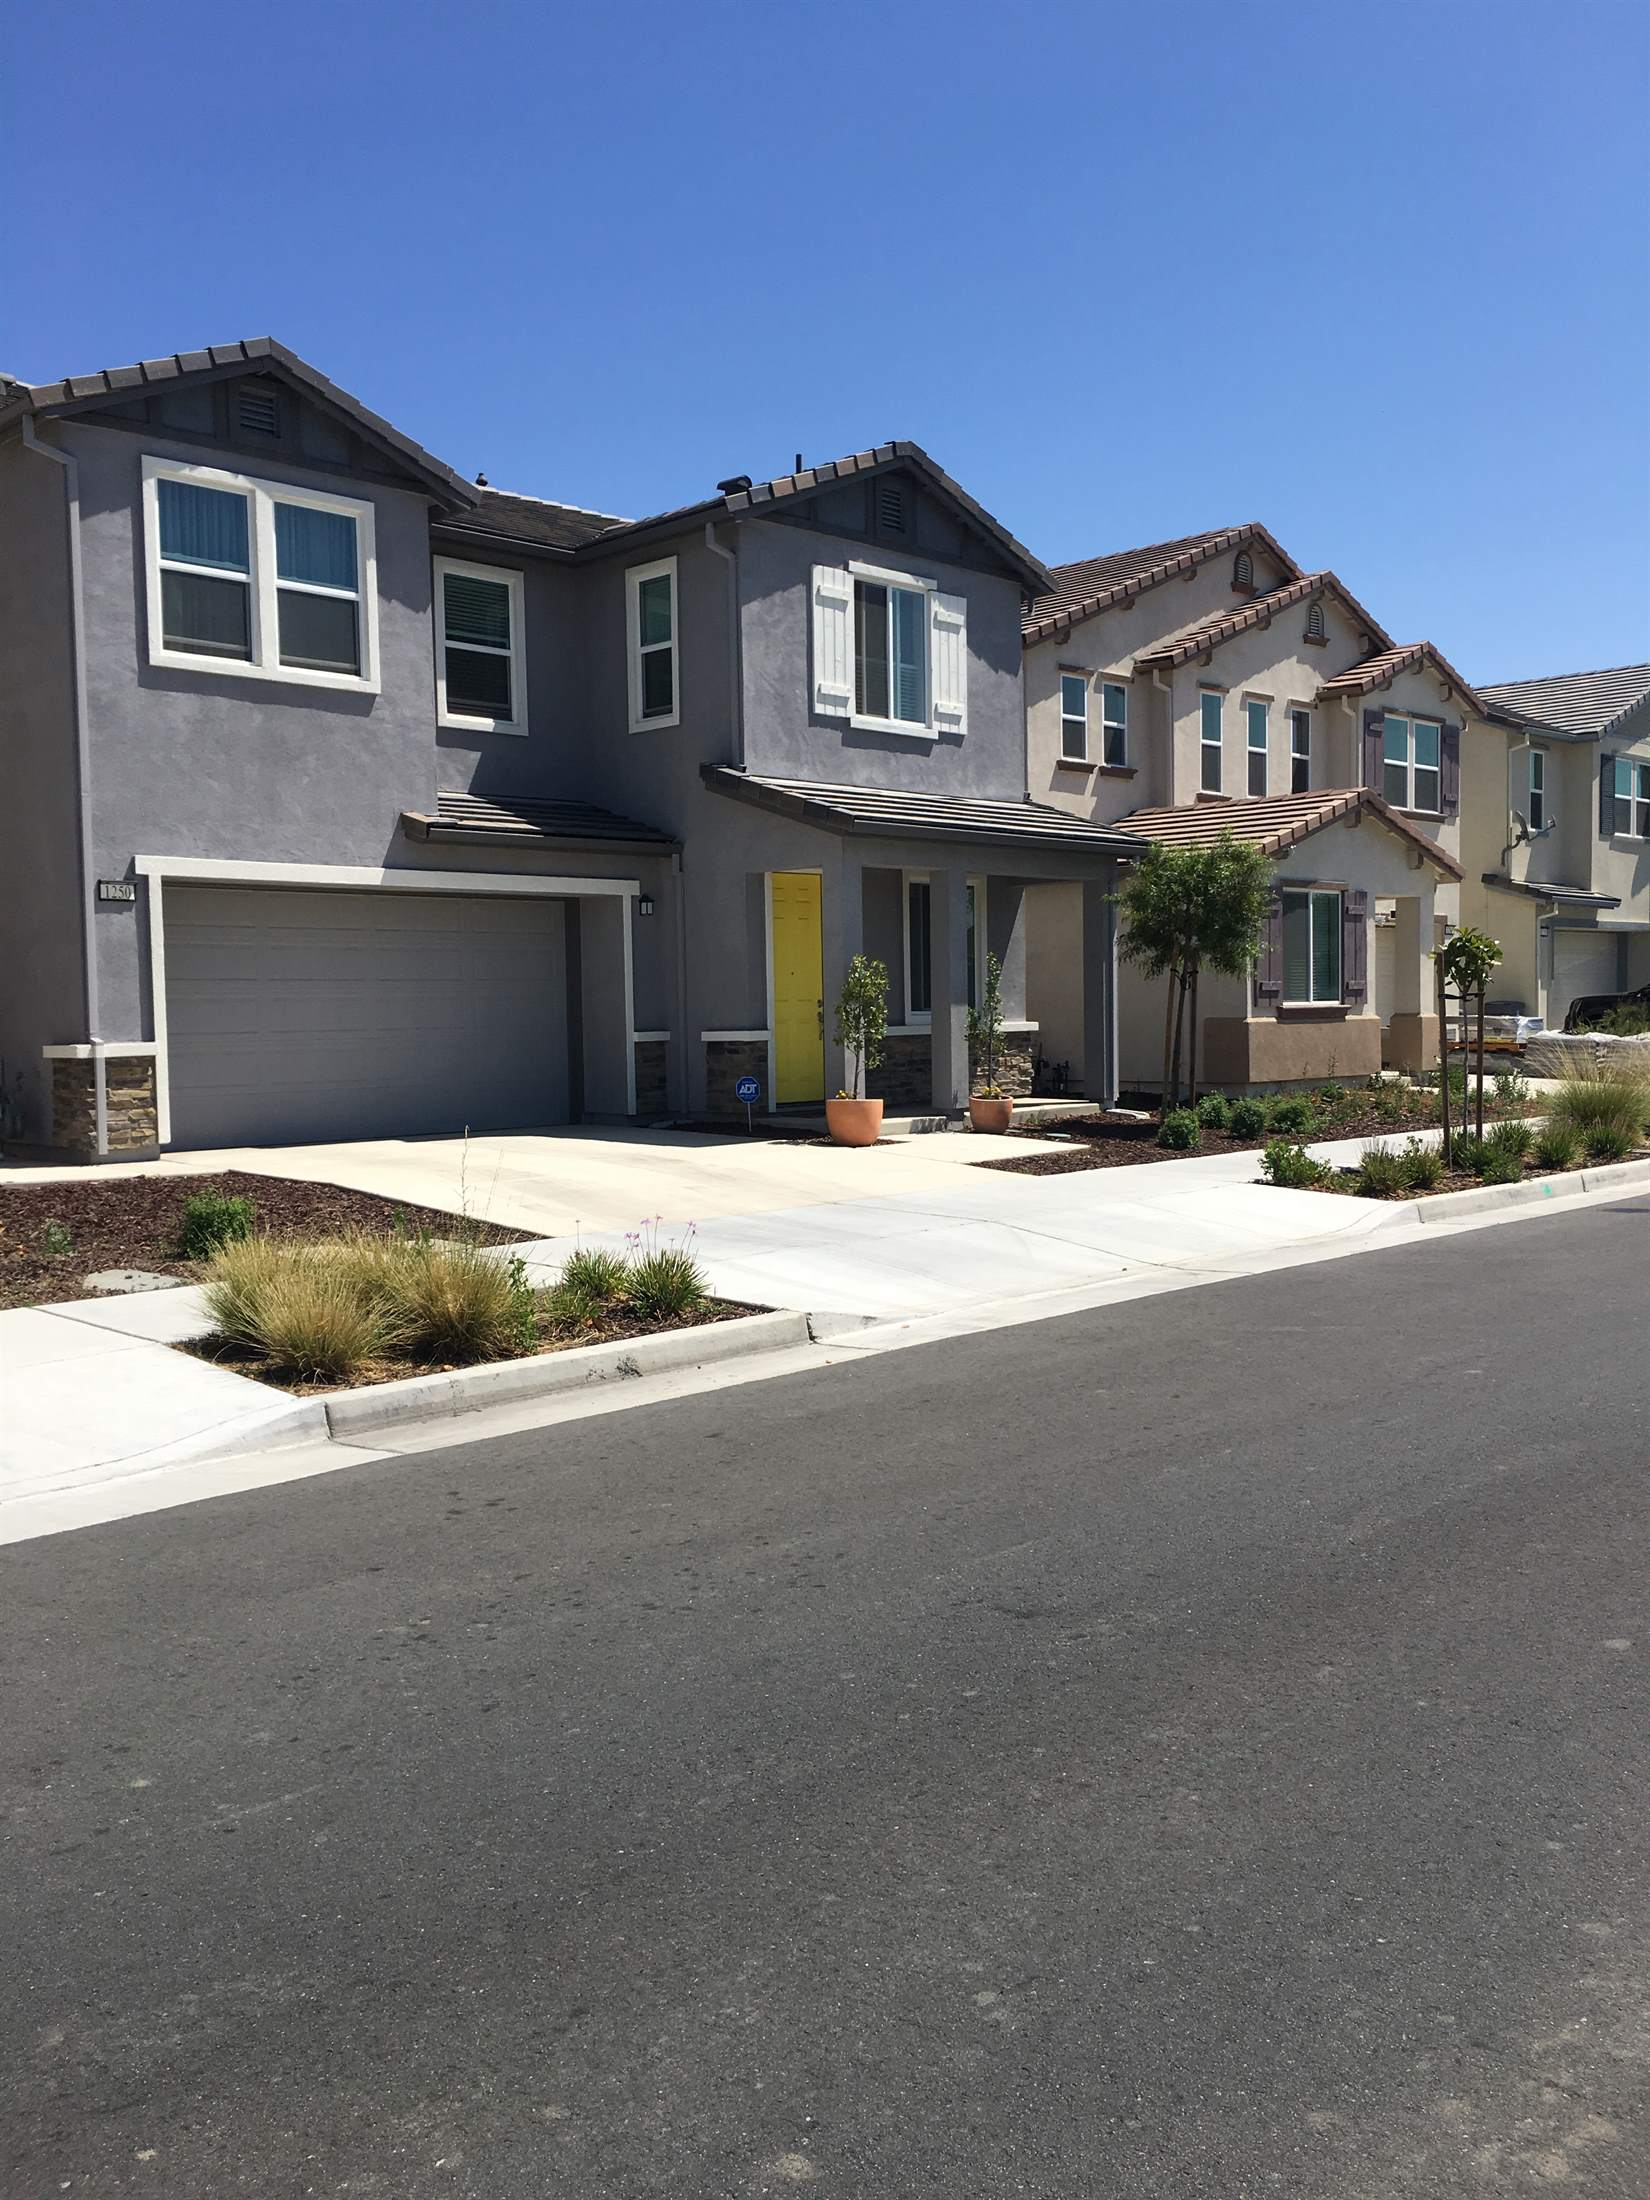 1250 Central Ave, Hollister, California